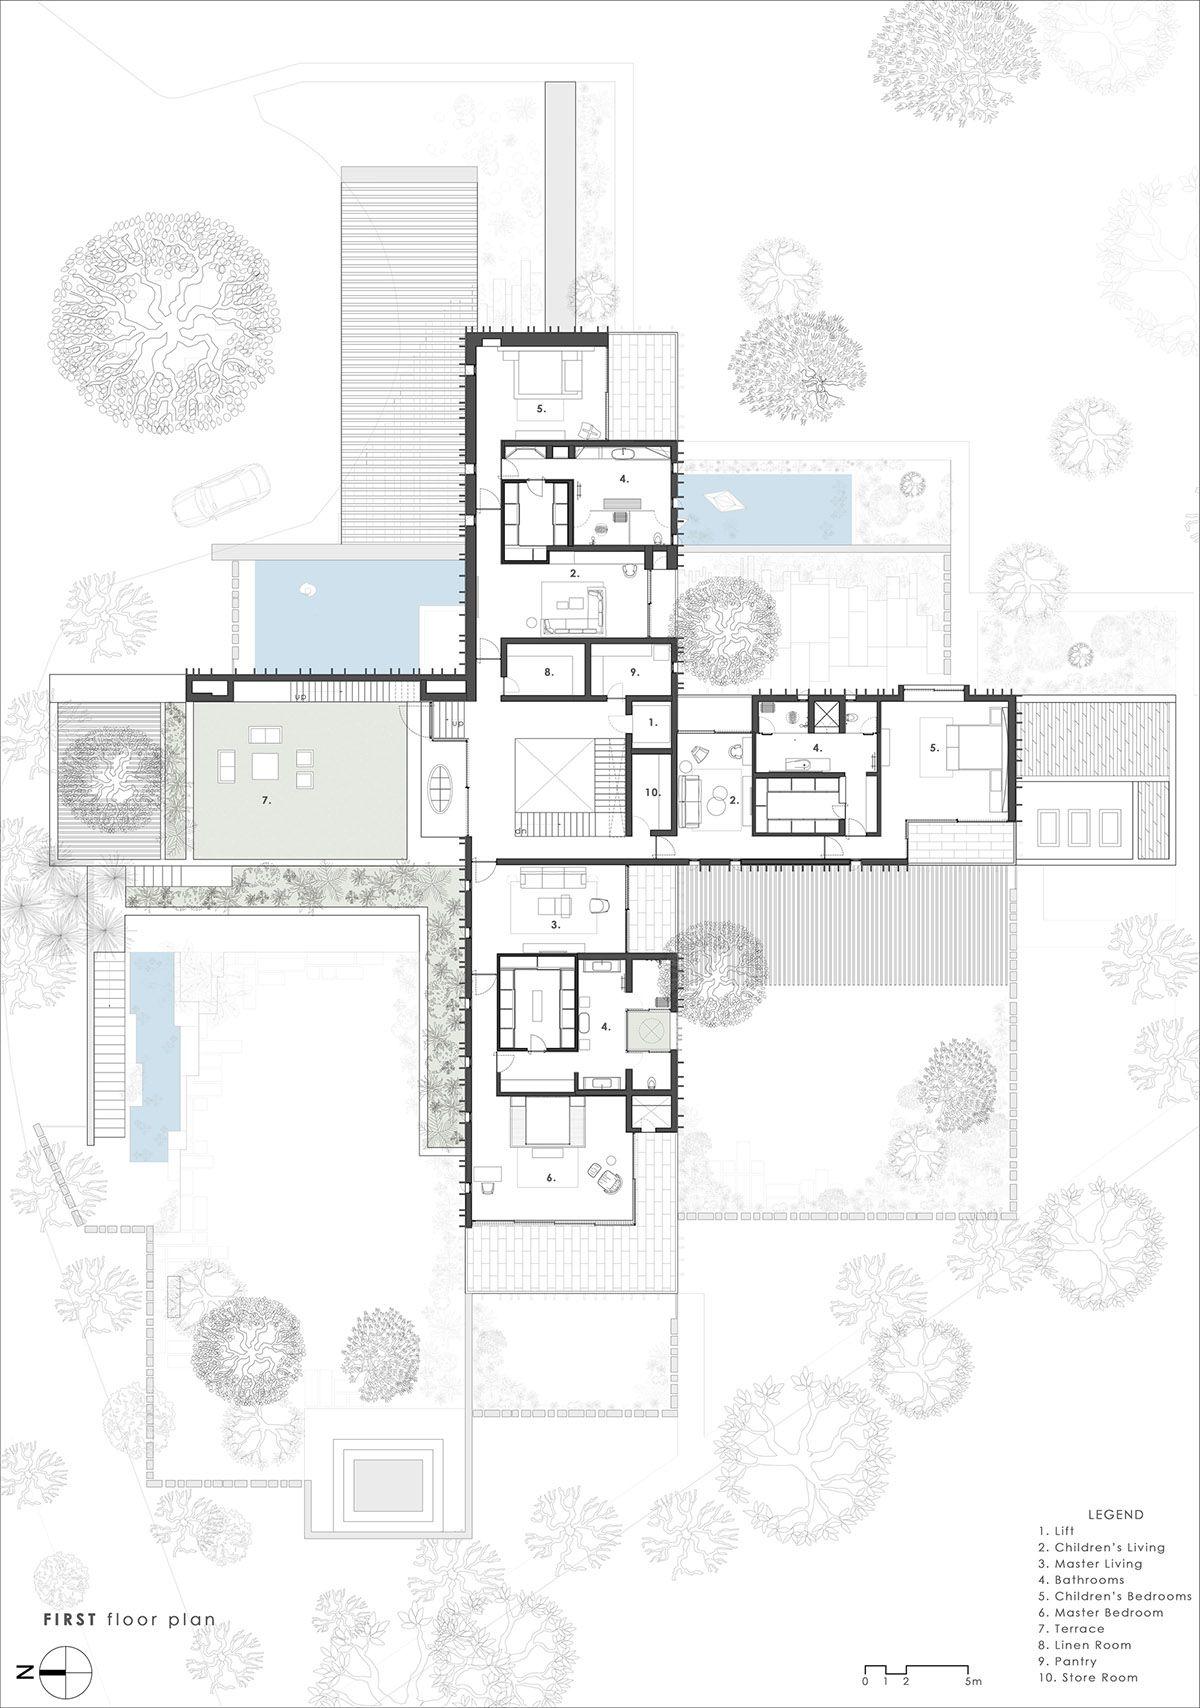 Cross Shaped Modern Home In Peaceful Landscaped Gardens Floor Plan Layout Modern House Design Architect Design